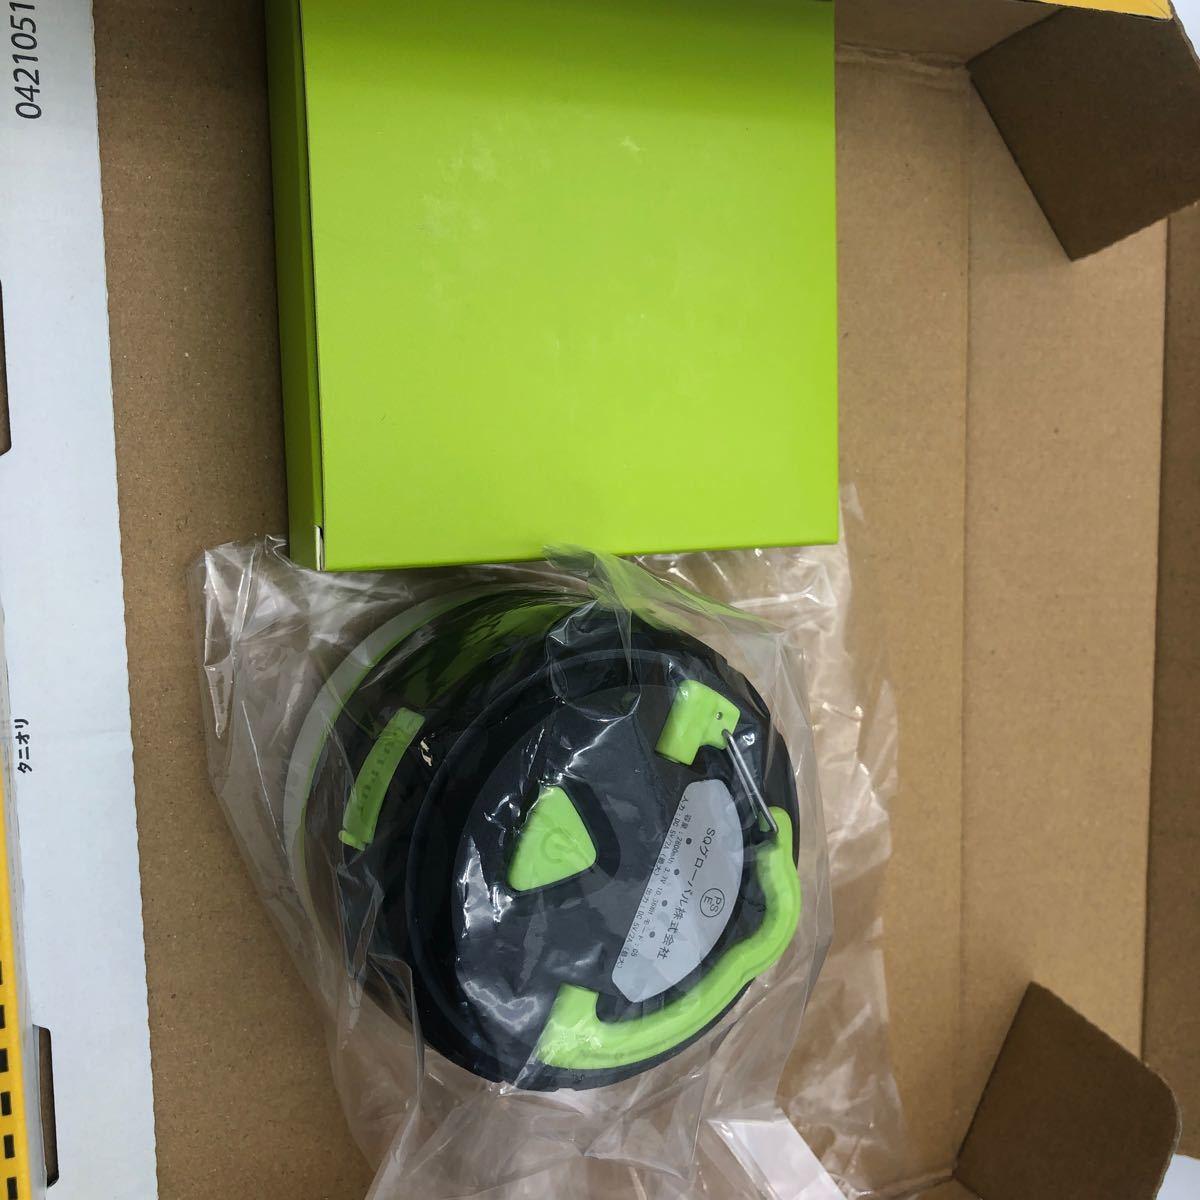 LEDランタン 暖色 電球色 USB充電式 モバイルバッテリー IP65 防水&防塵